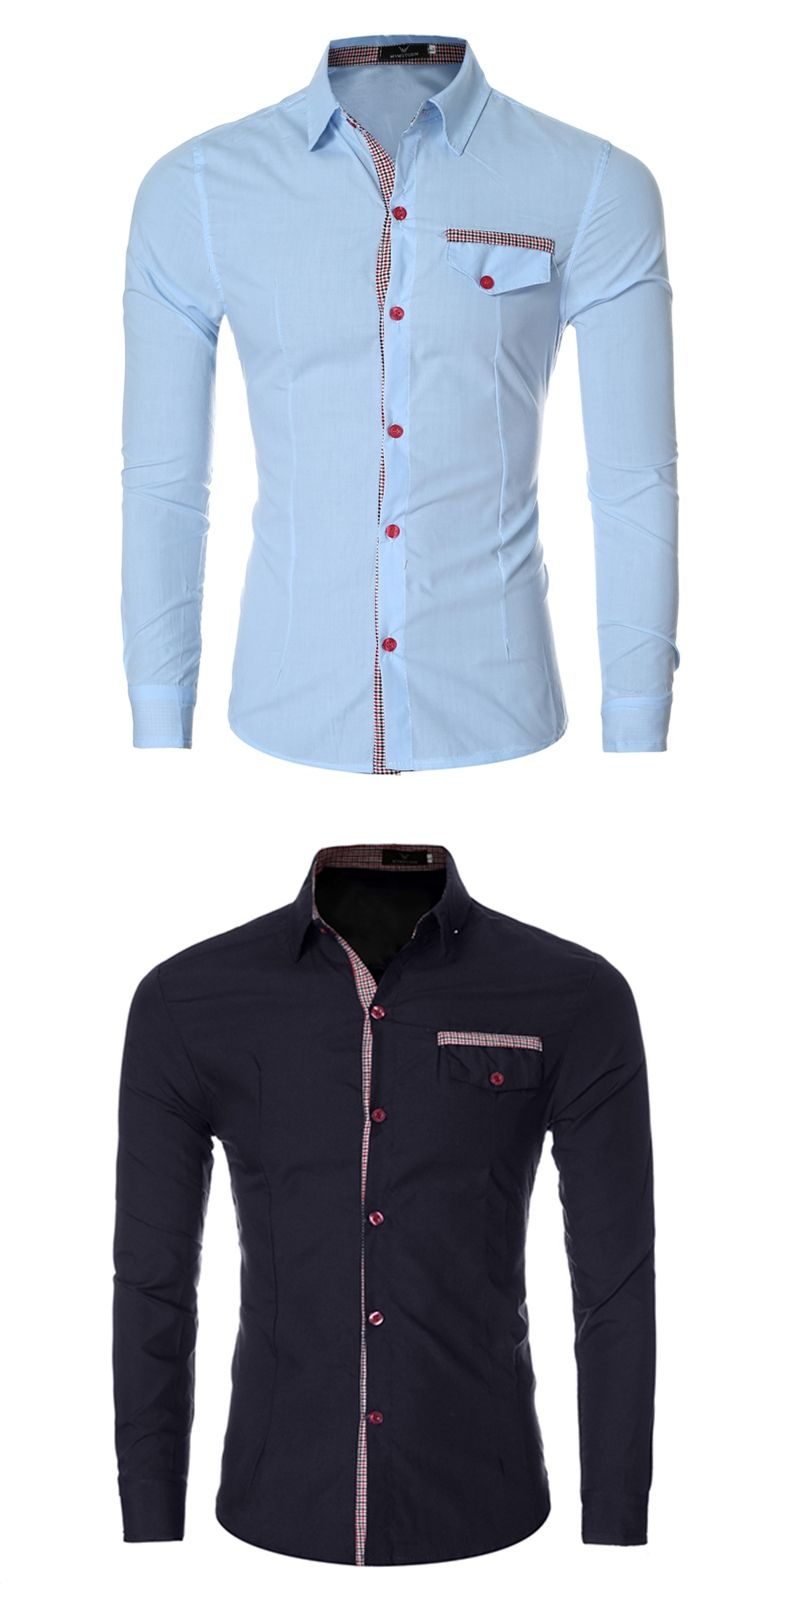 8bb0885b40b Male Dress Shirts 2017 Autumn Mens Shirt Slim Fit Chemise Homme Shirt  Striped False Pocket Heren